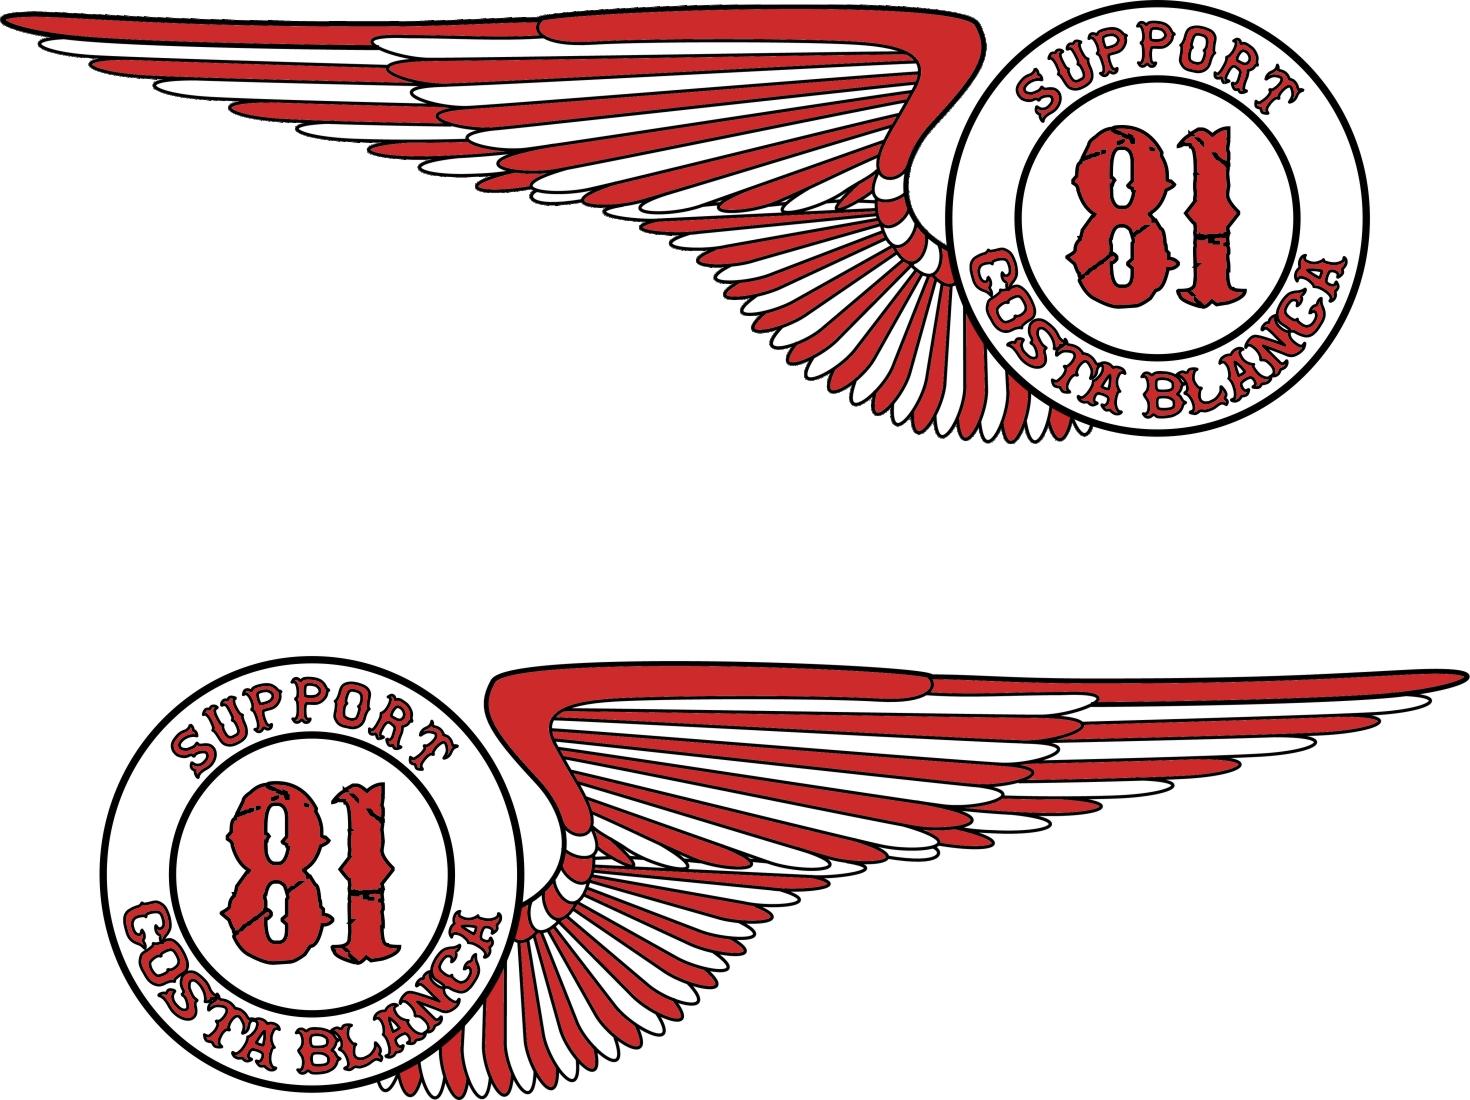 Hells Angels Support 81 Adesivo Wings 2x 10cm Hells Angels World  -> Adesivo Com Foto